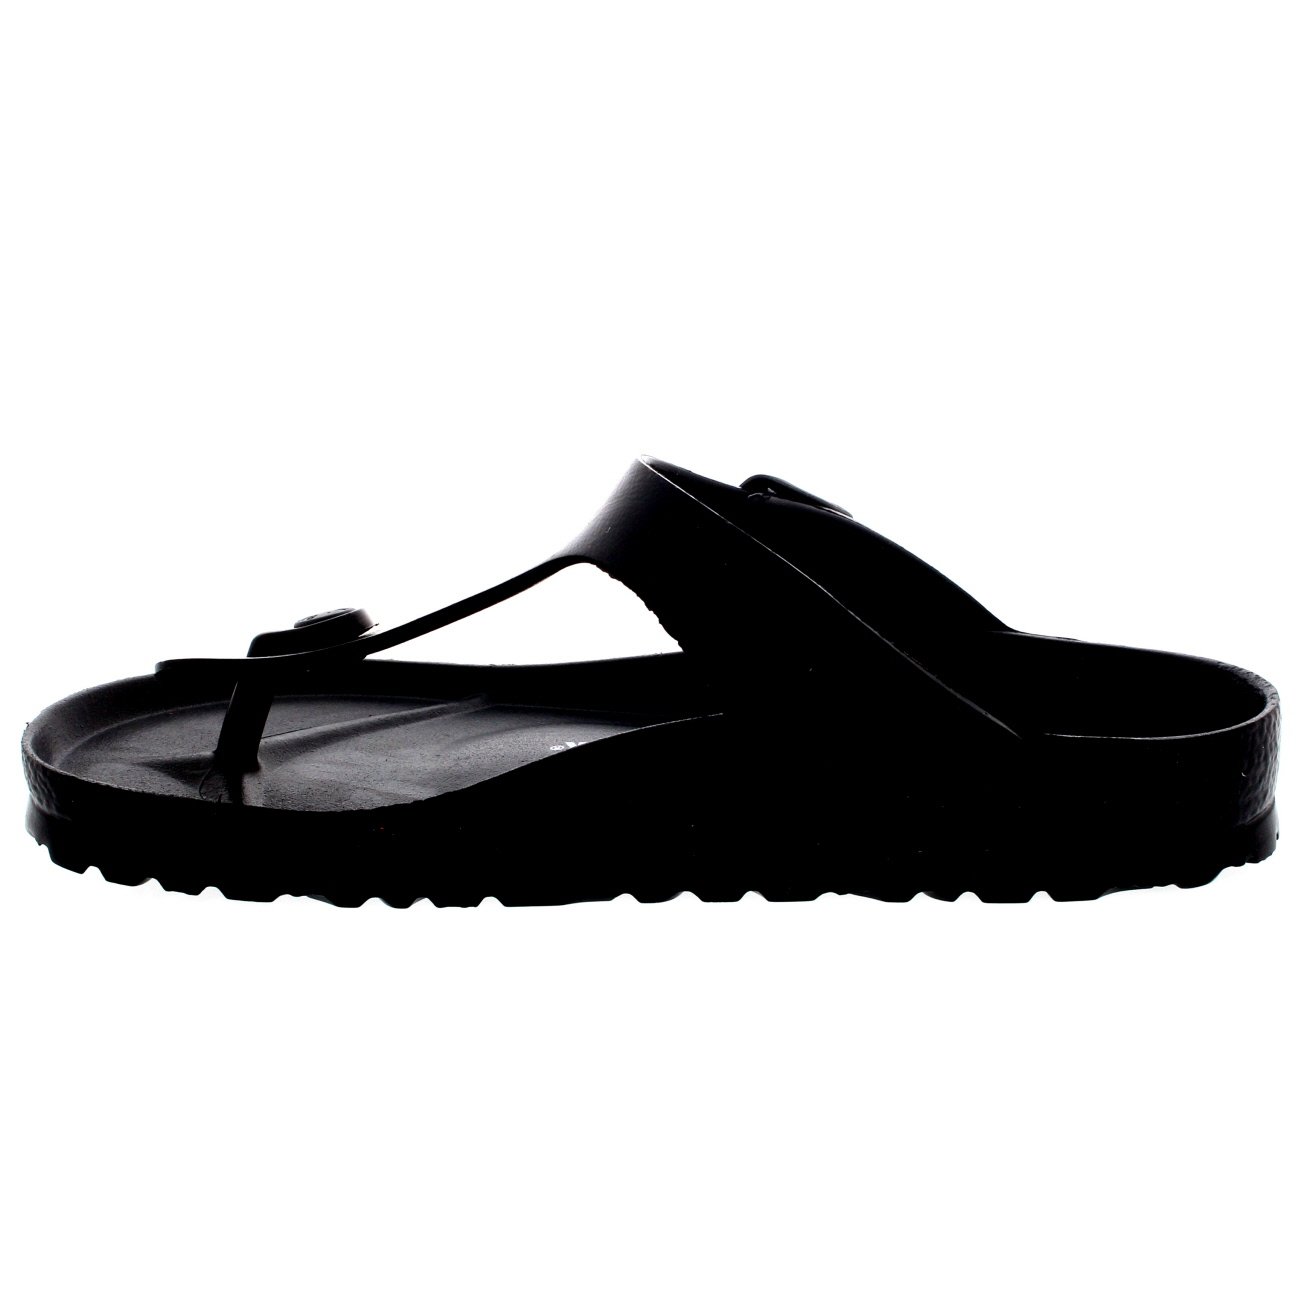 Unisex-Adults-Birkenstock-Gizeh-Summer-EVA-Toe-Post-Beach-Flat-Sandals-All-Sizes thumbnail 13